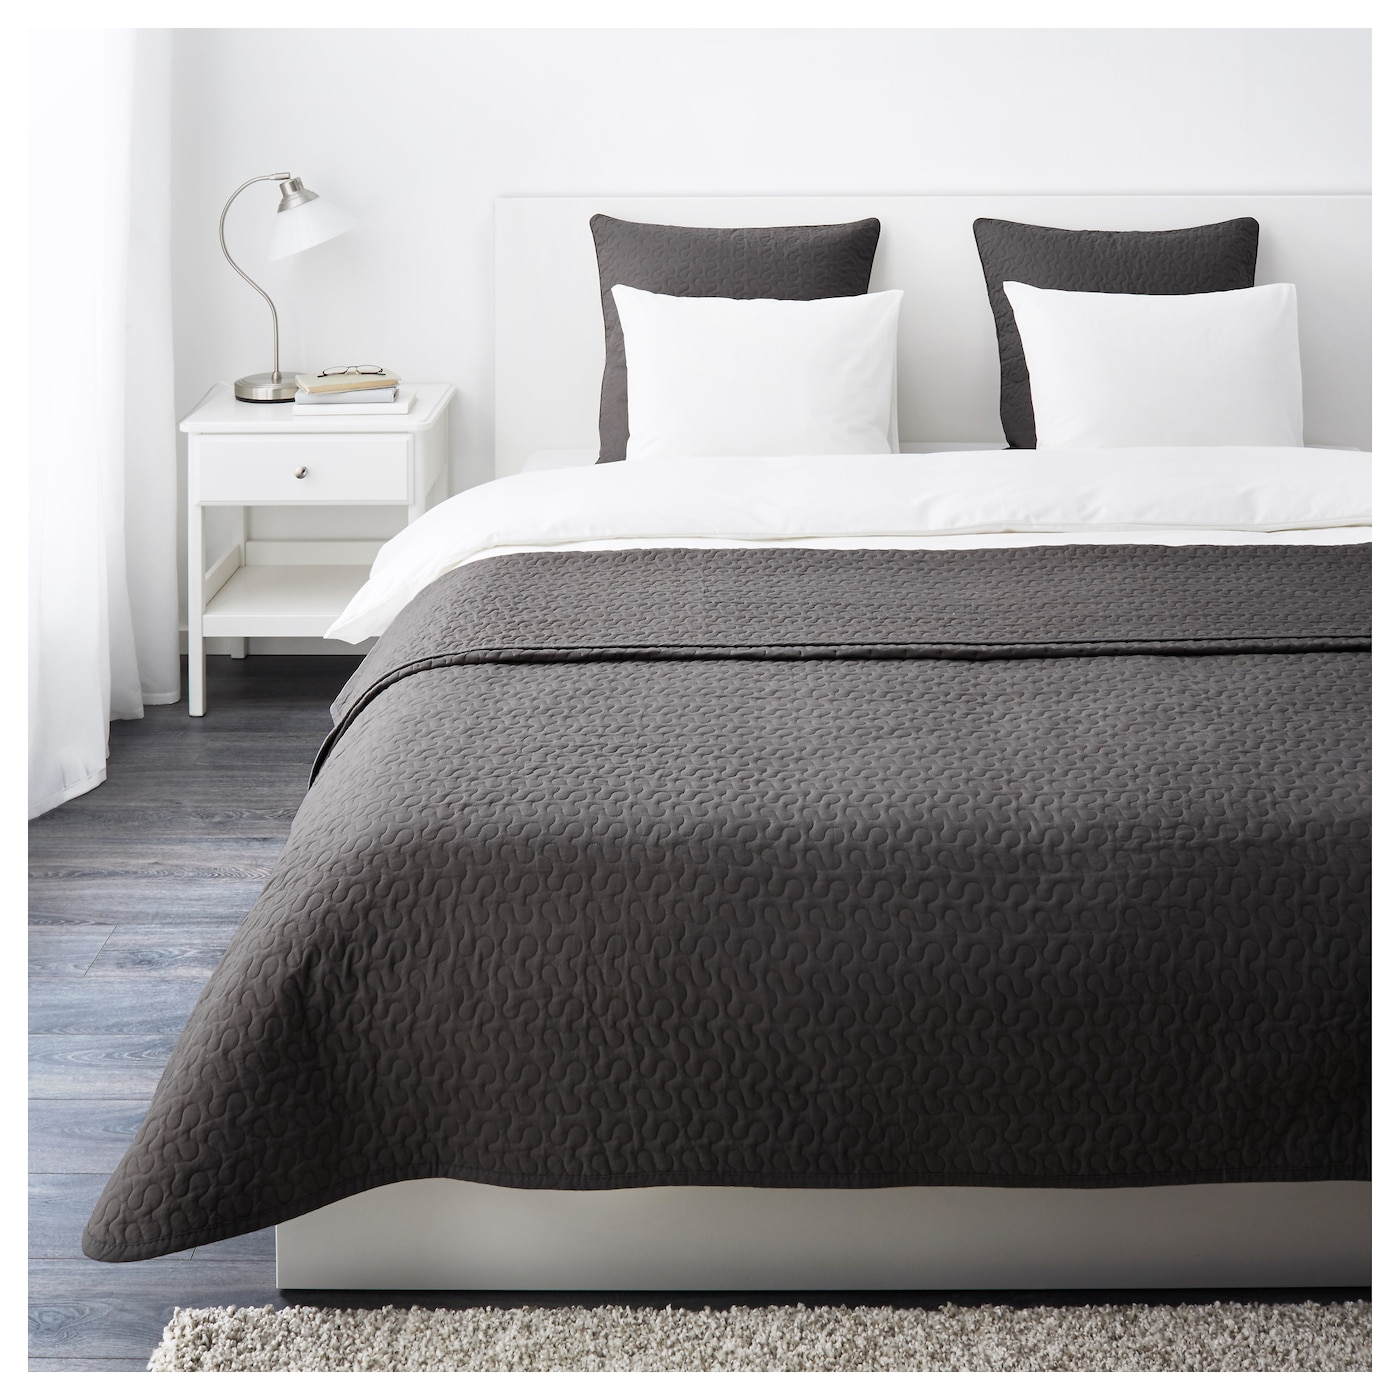 ALINA Bedspread and 2 cushion covers Dark grey 260x280/65x65 cm - IKEA